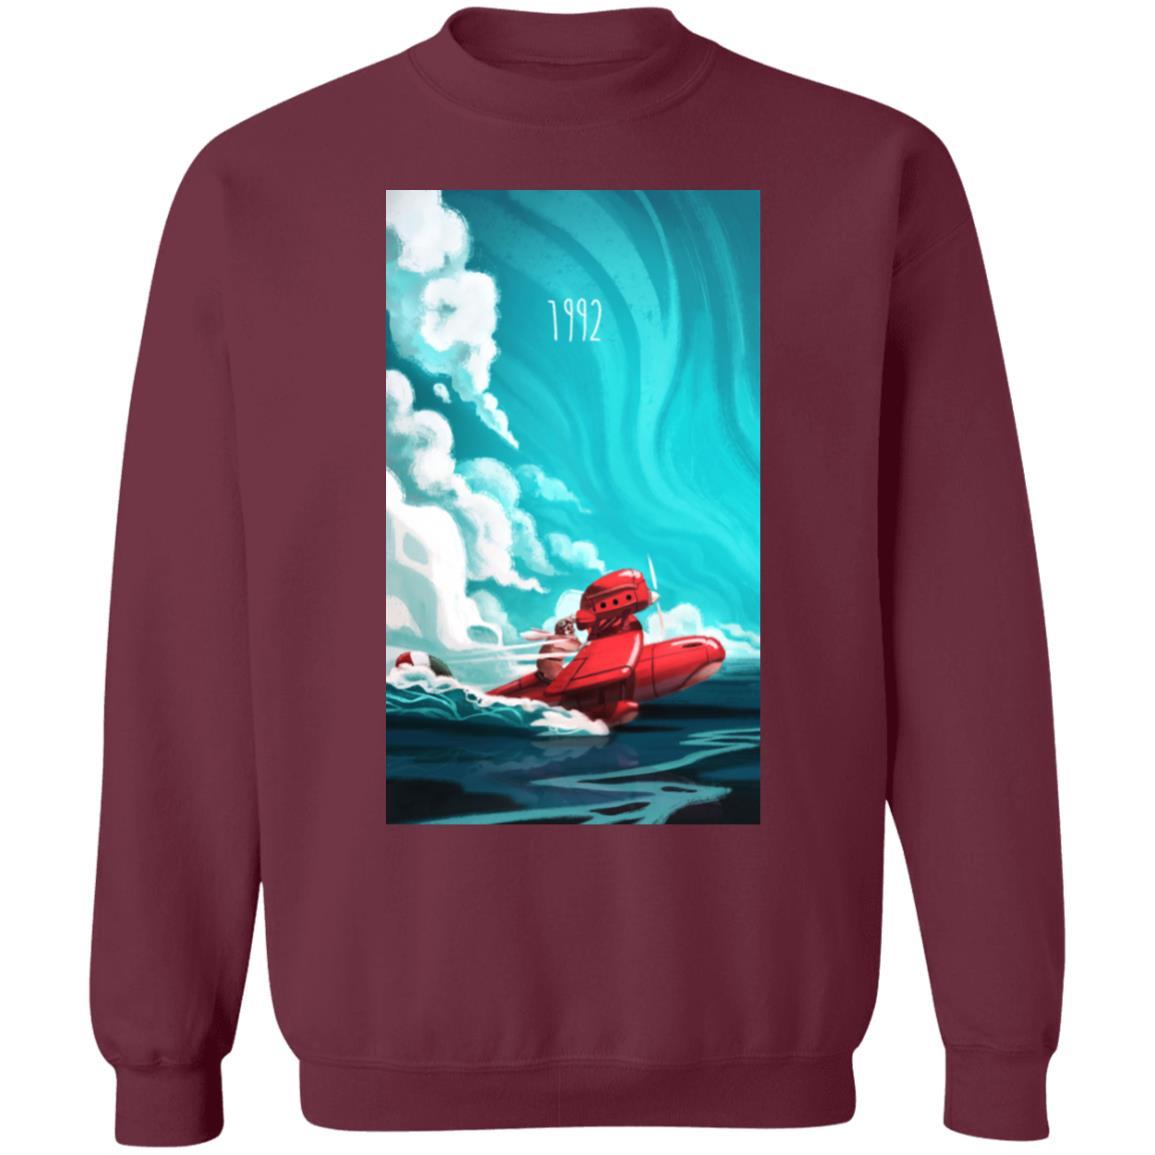 Porco Rosso 1982 Illustration Sweatshirt